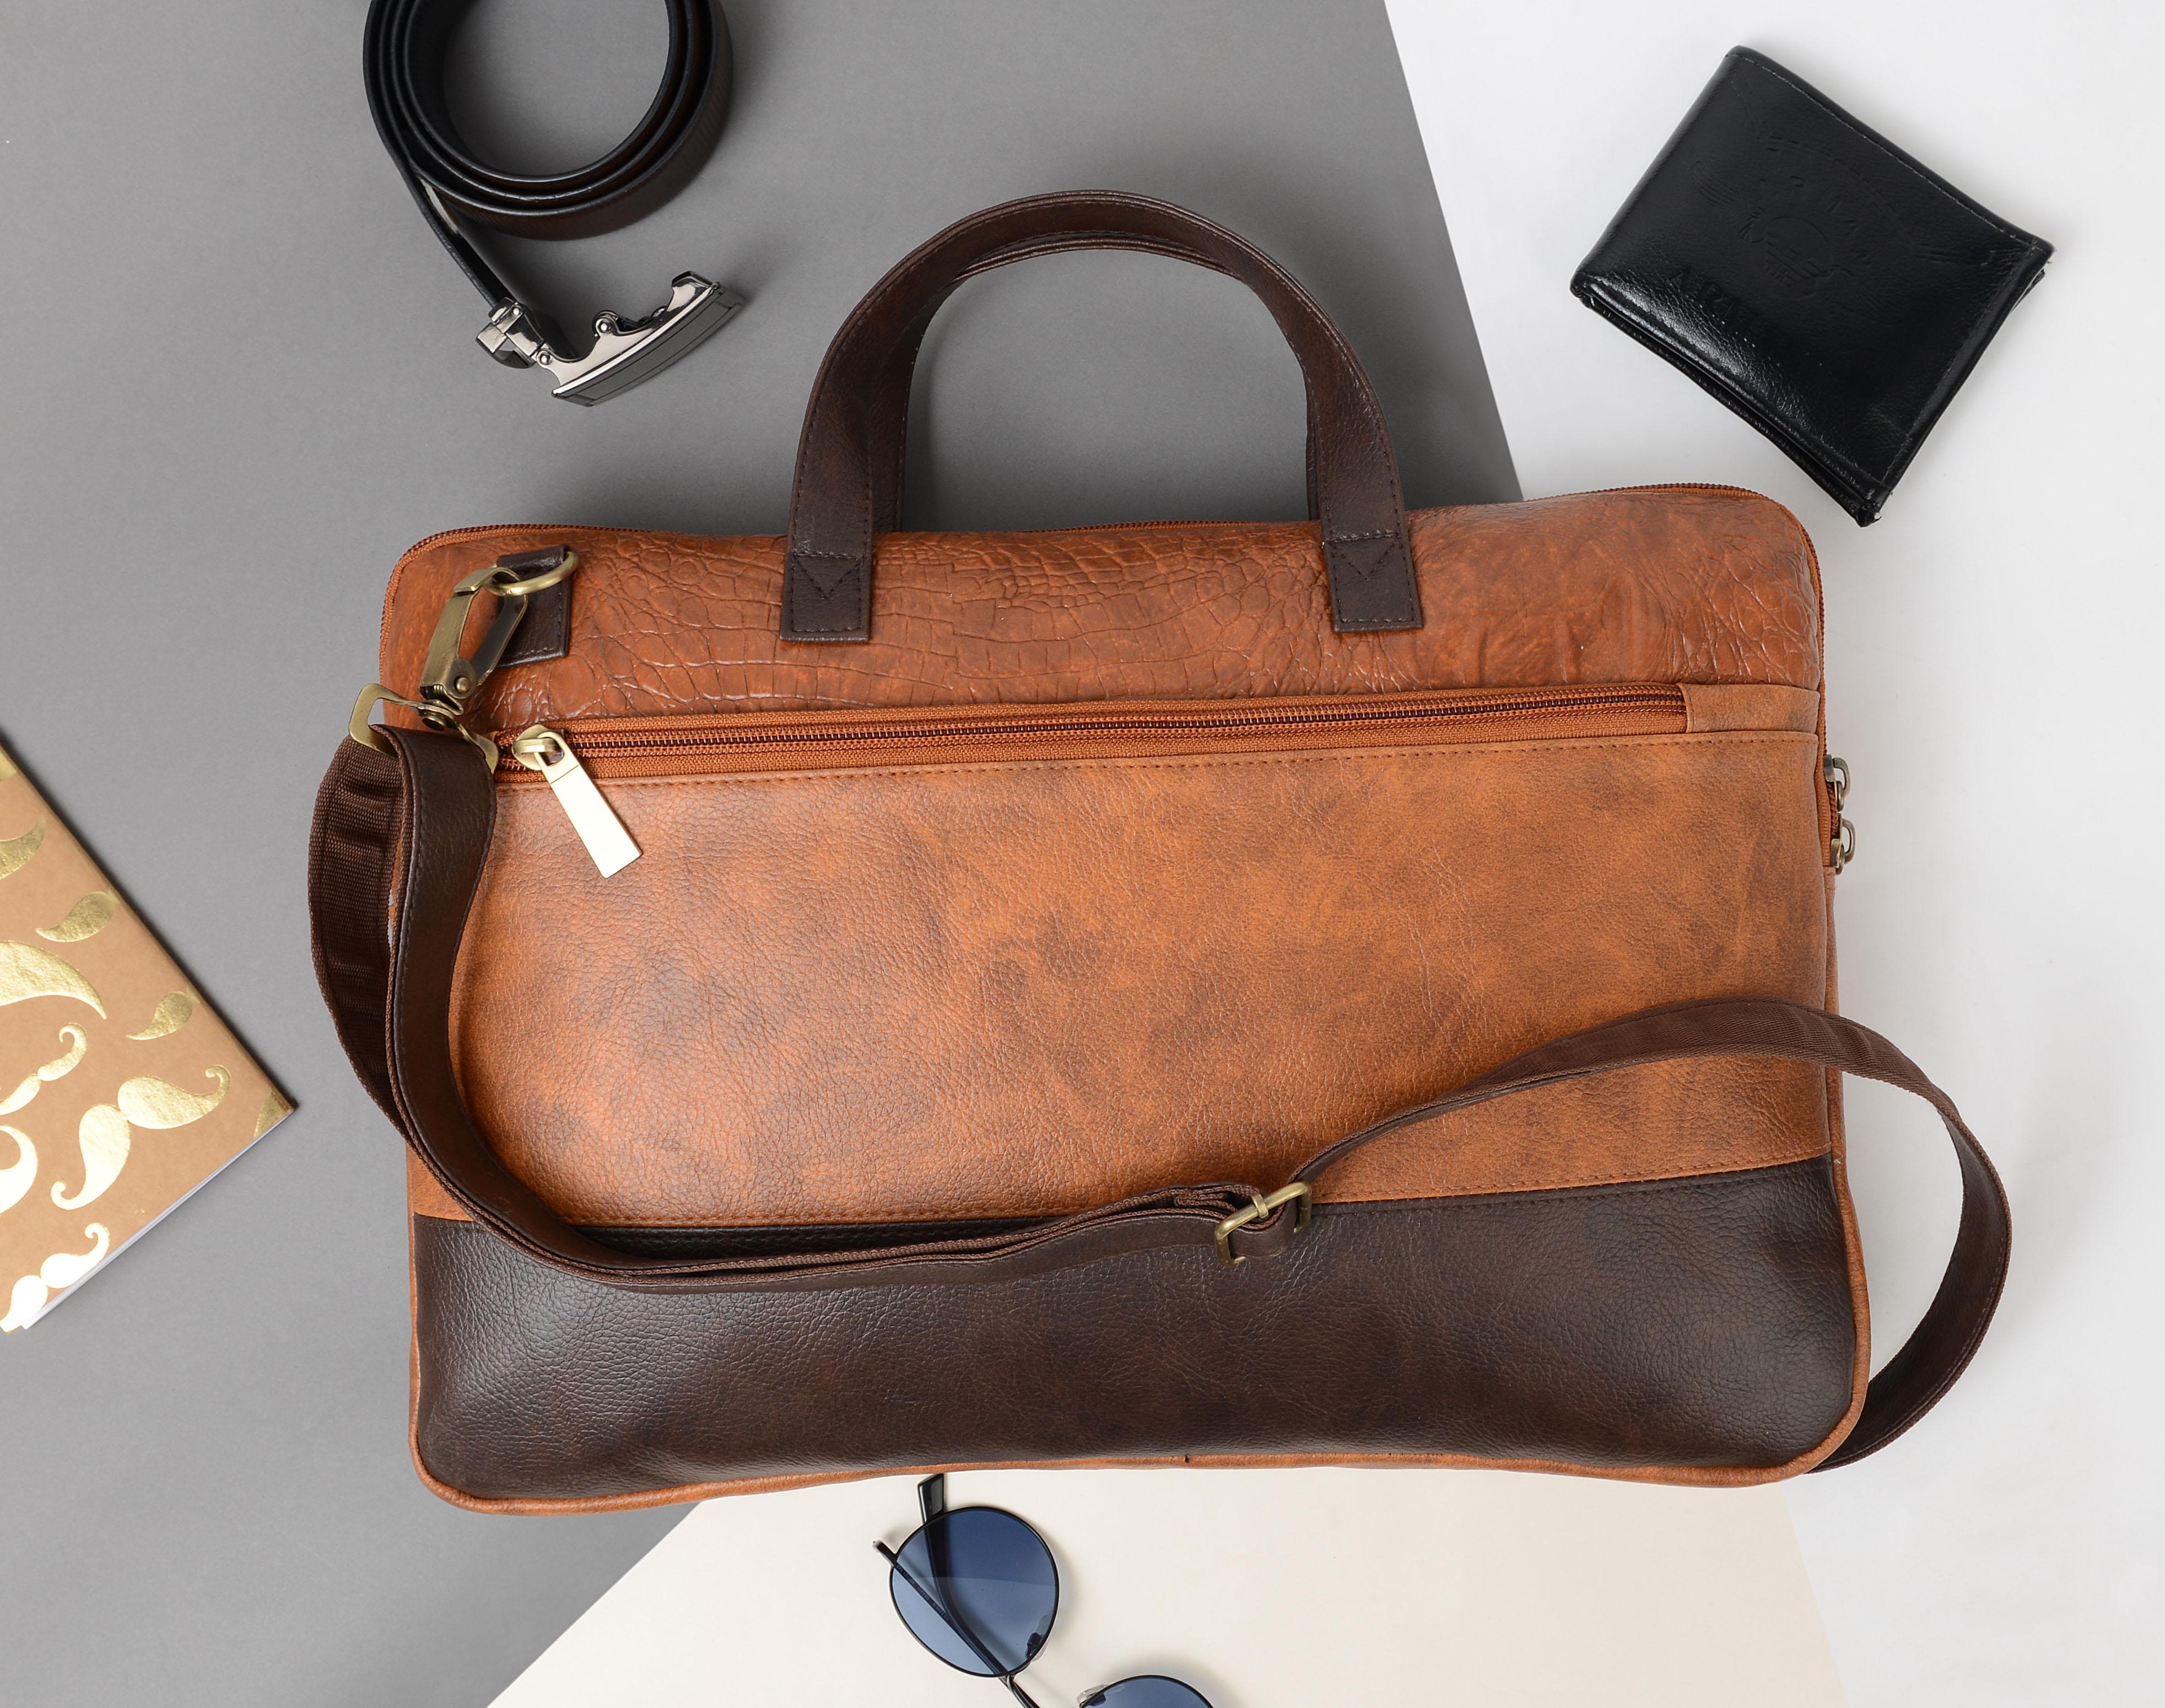 Vivinkaa | Vivinkaa Faux Leather 15.6 inch Tan/Coffee Padded Laptop Messenger bag for Men & Women